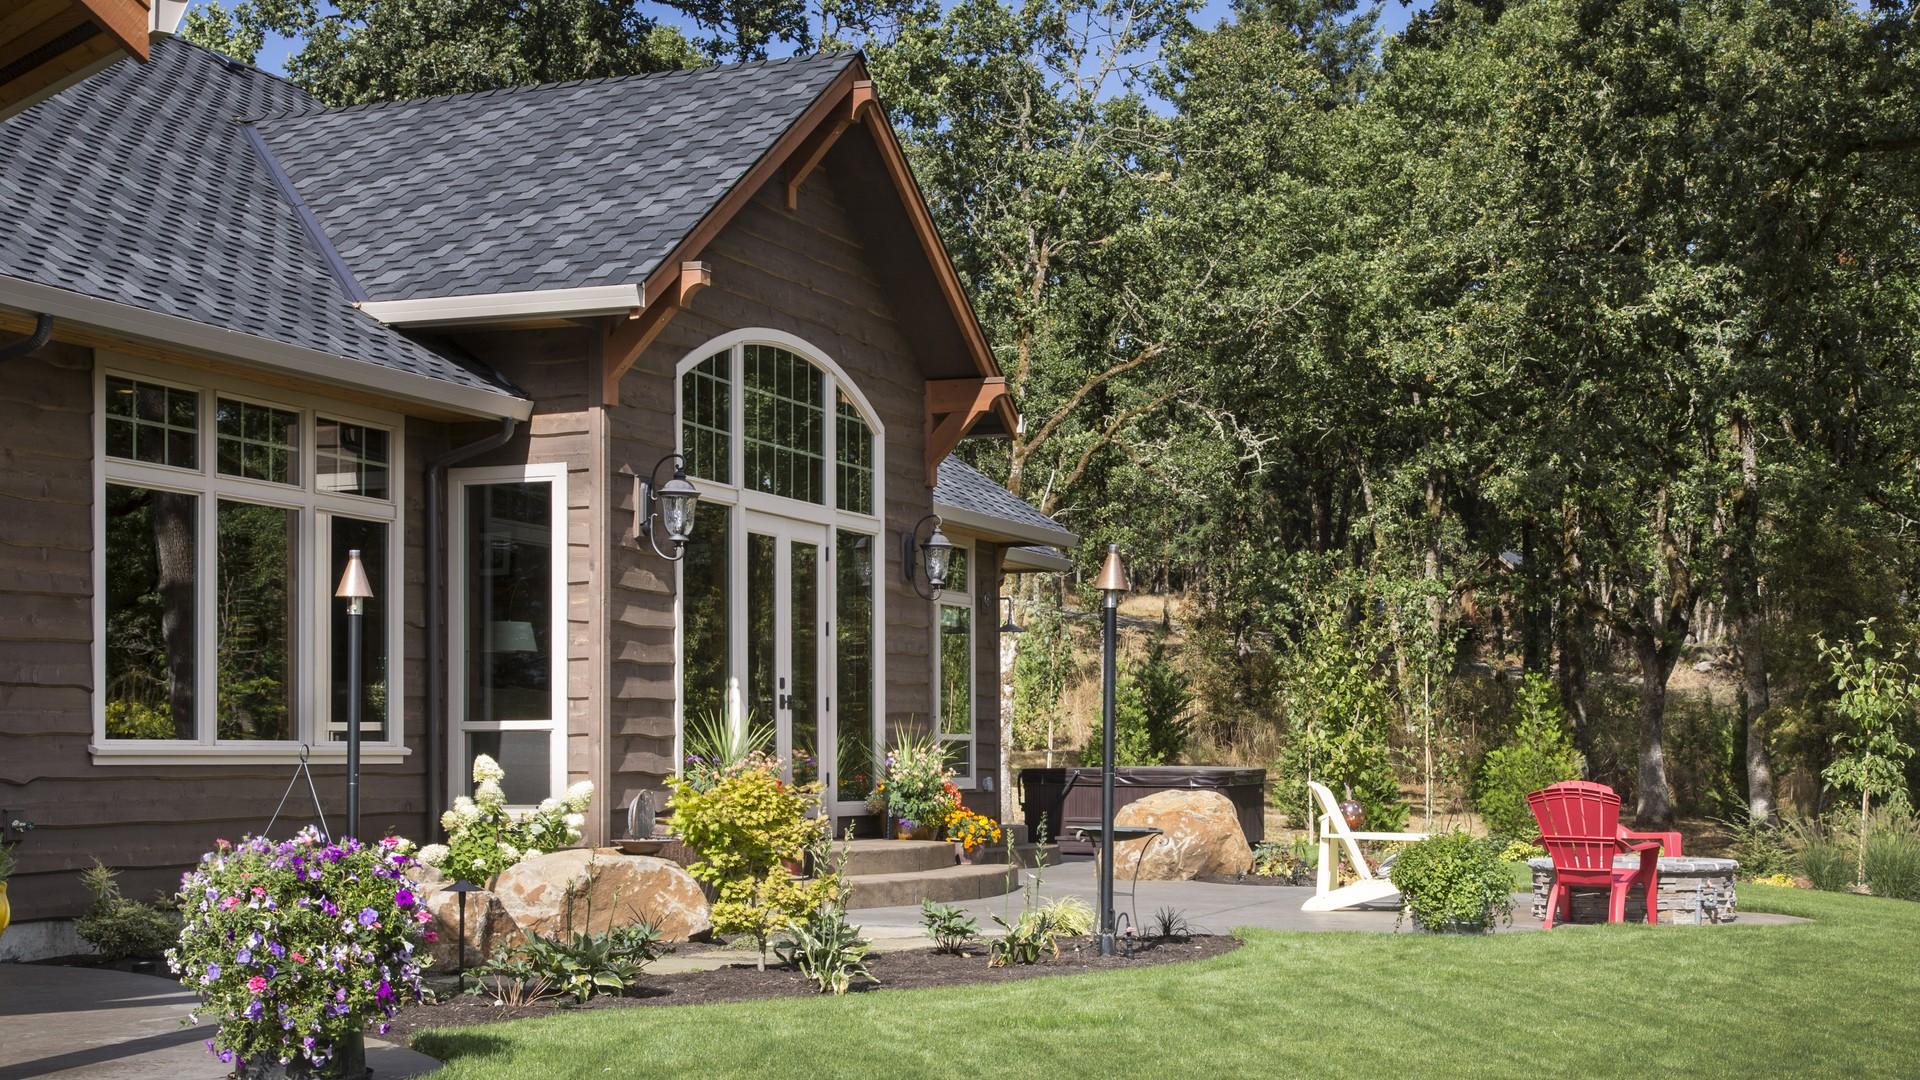 Craftsman House Plan 1250 The Westfall: 2910 Sqft, 3 Bedrooms, 3 ...